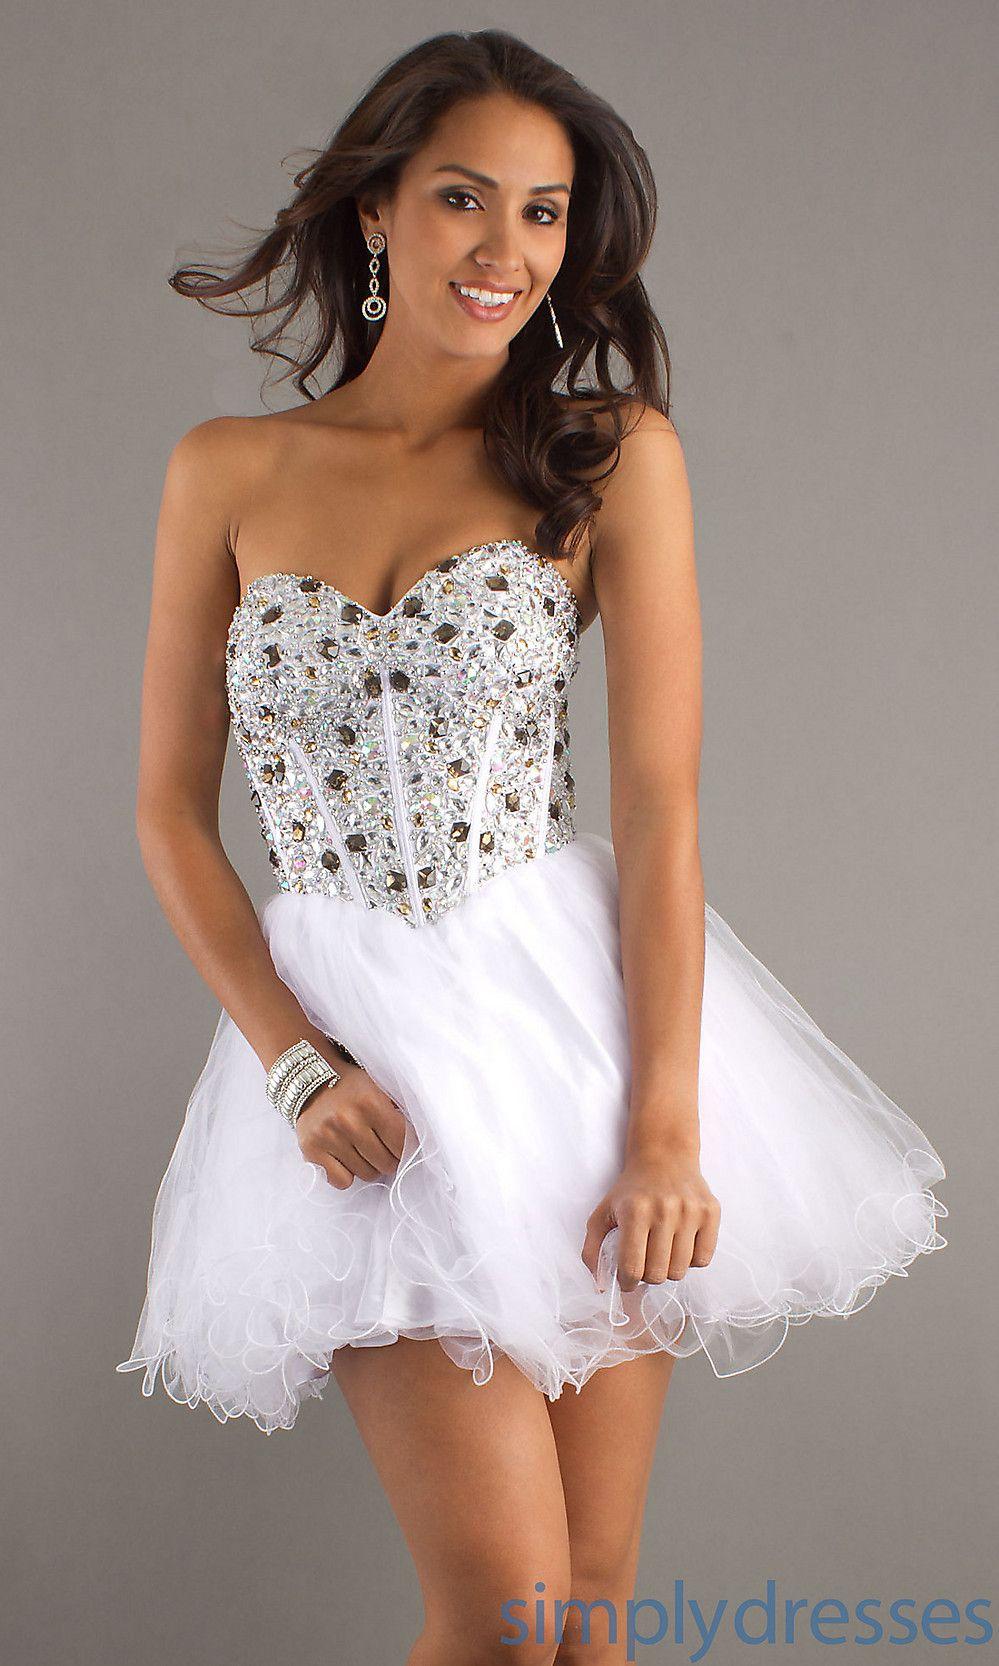 Strapless short prom dresses alyce prom dresses simply dresses